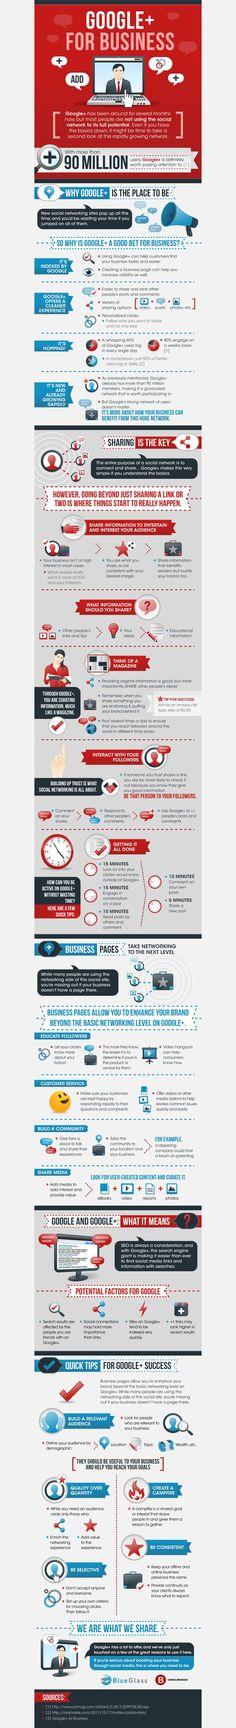 21 insightful social media infographics photo